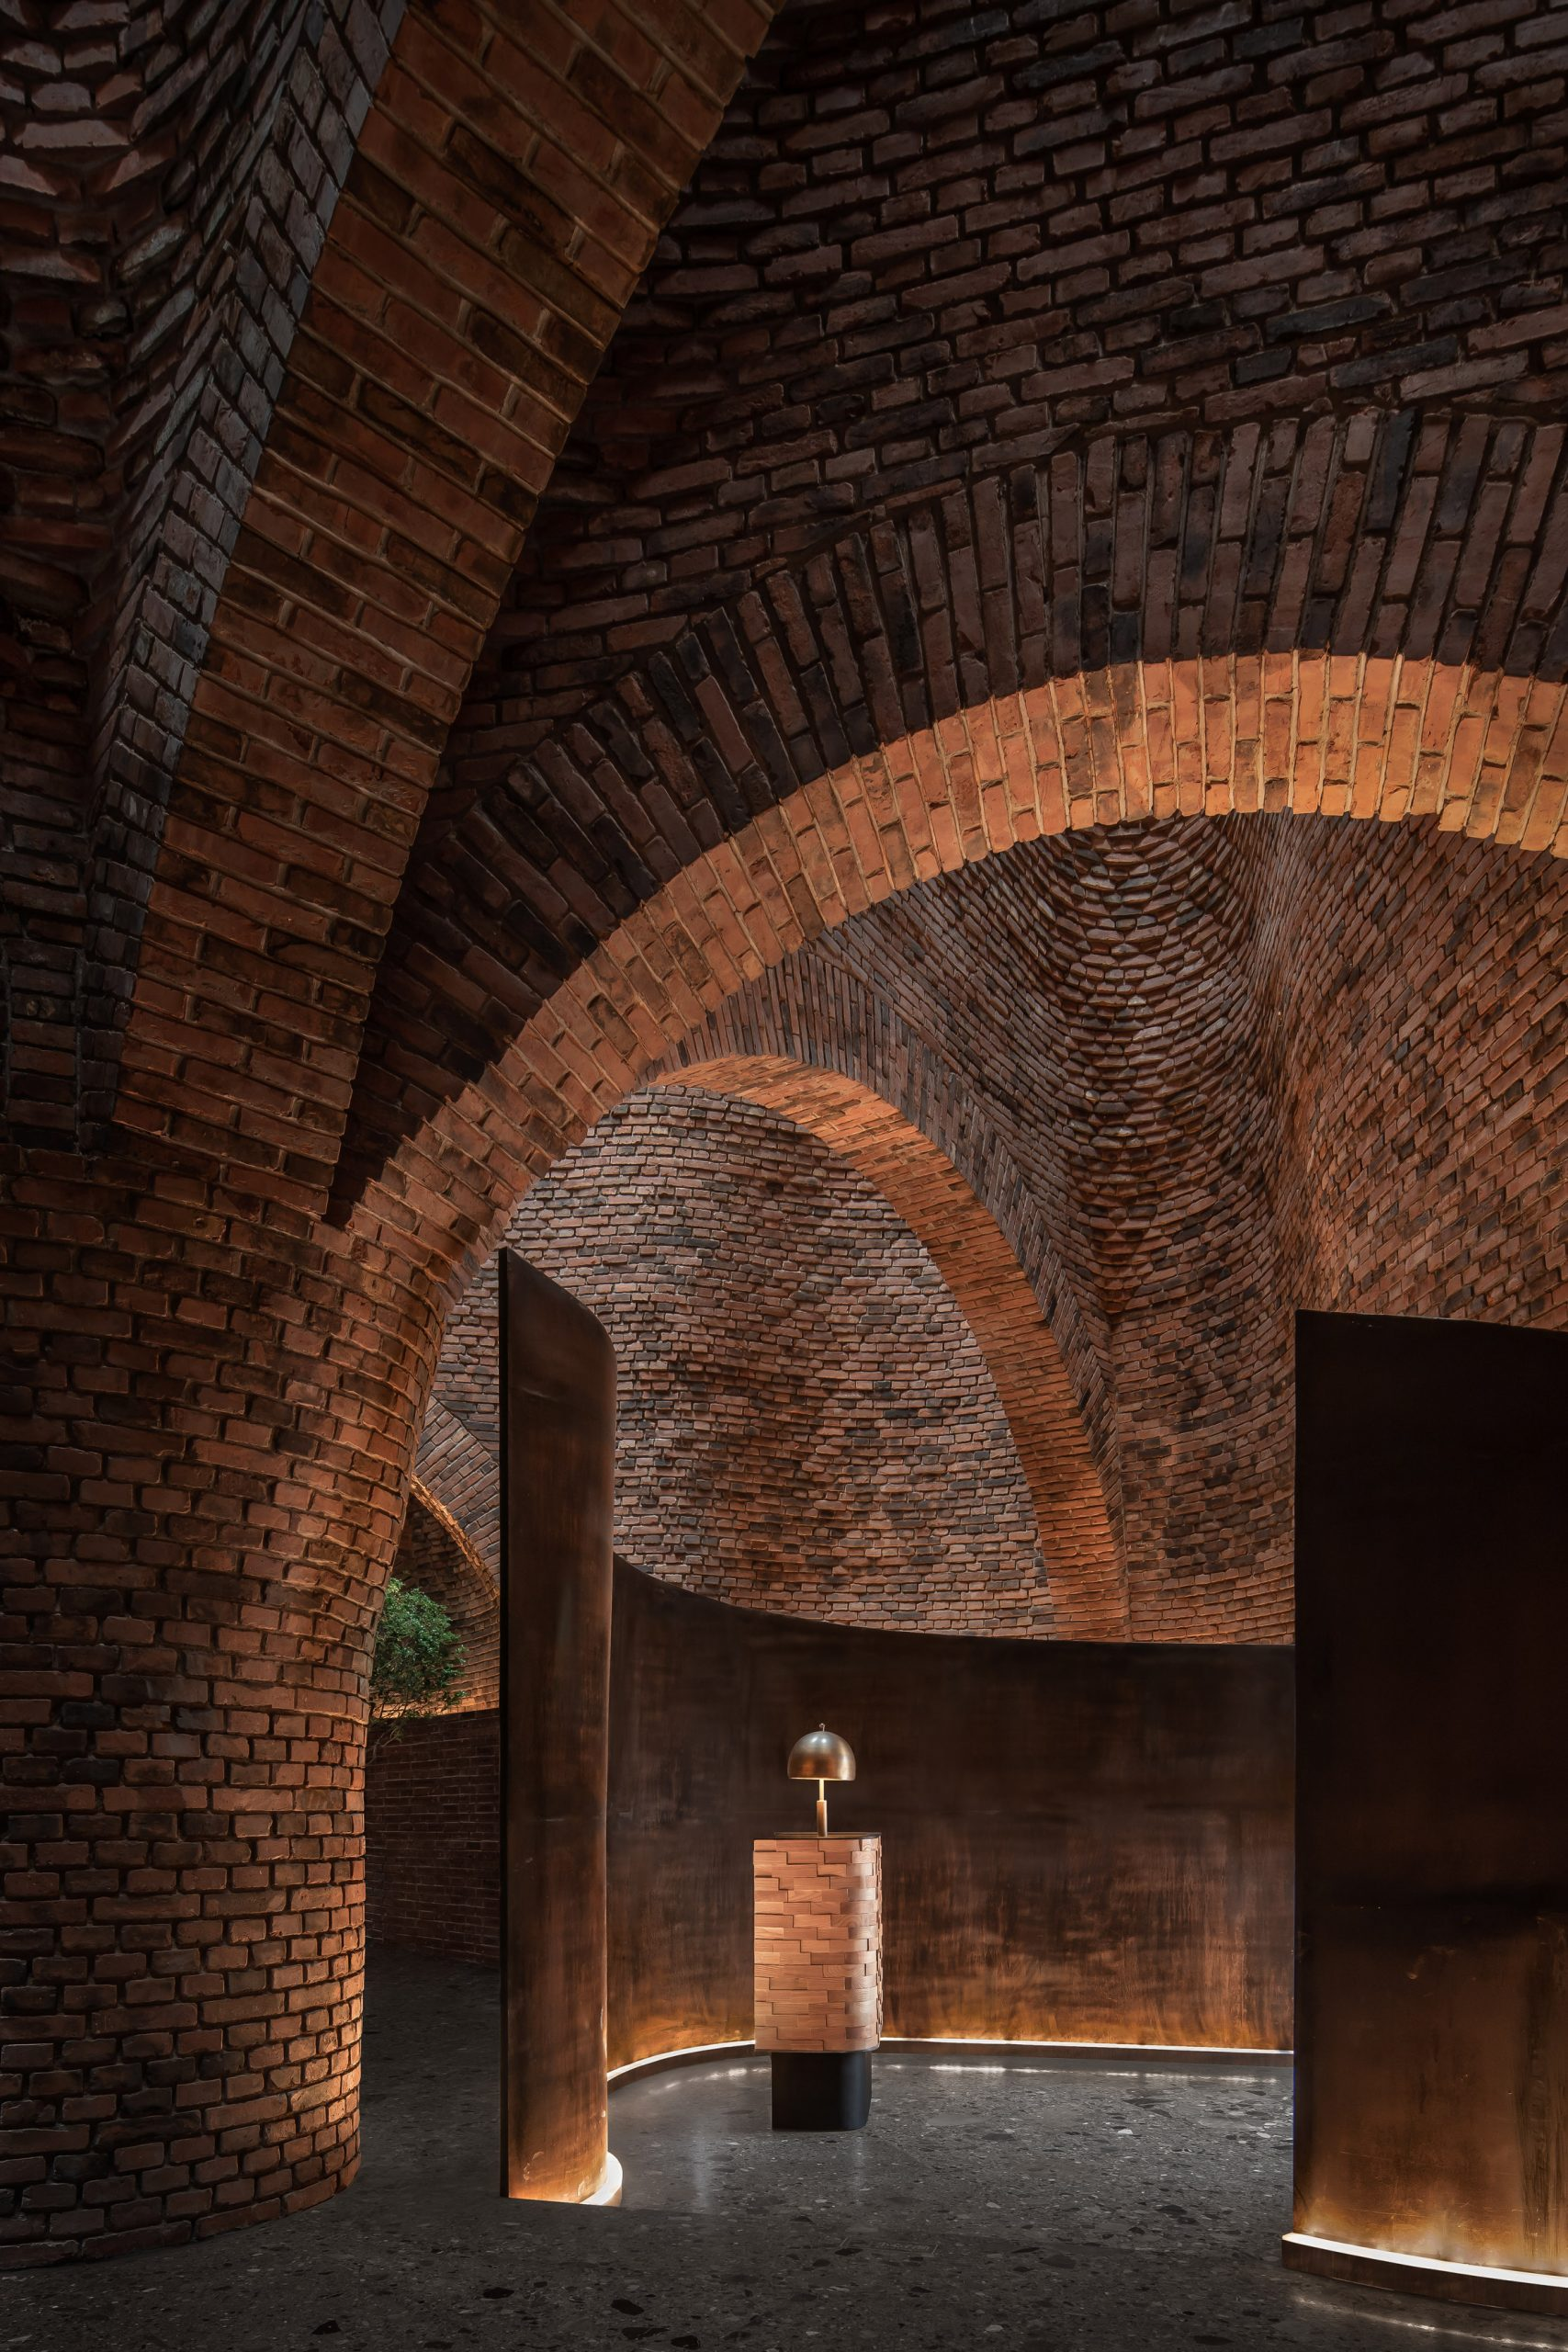 A red-brick restaurant interior